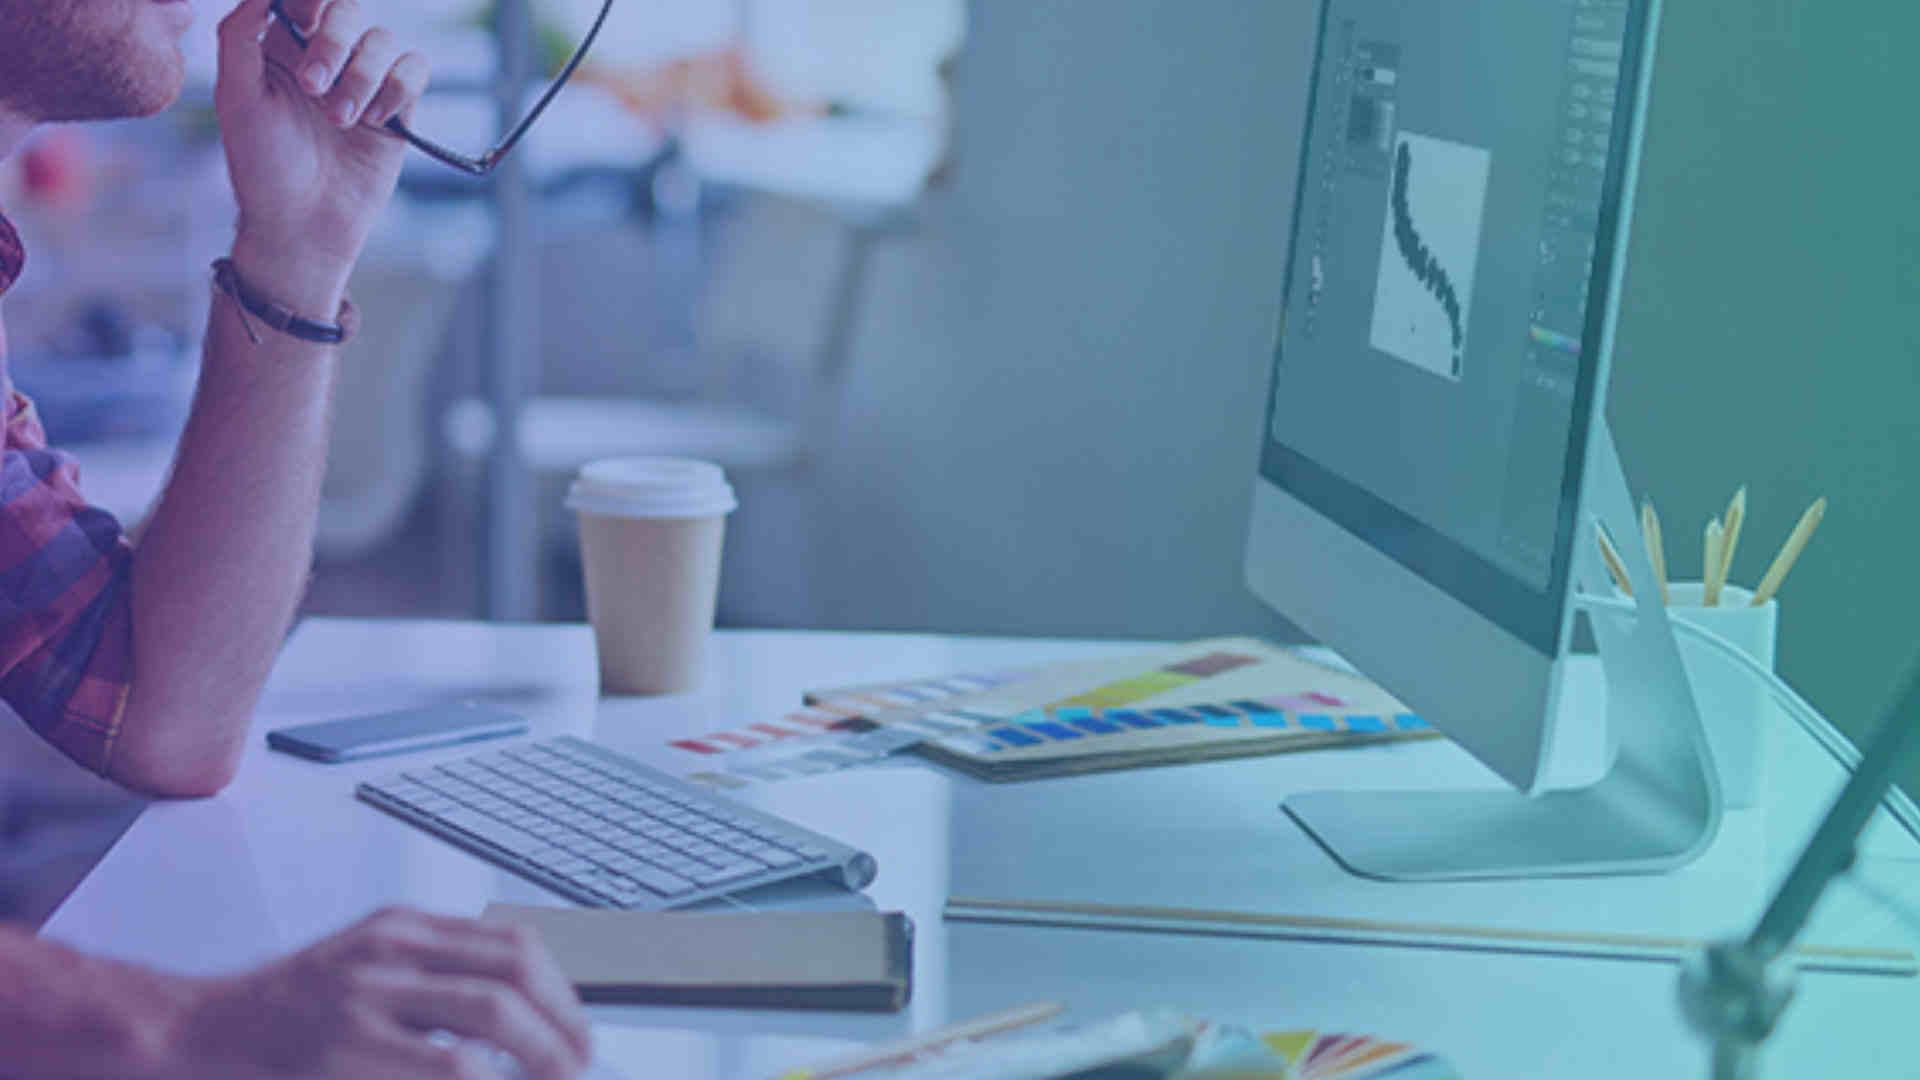 Graphic design for business professionals Canada